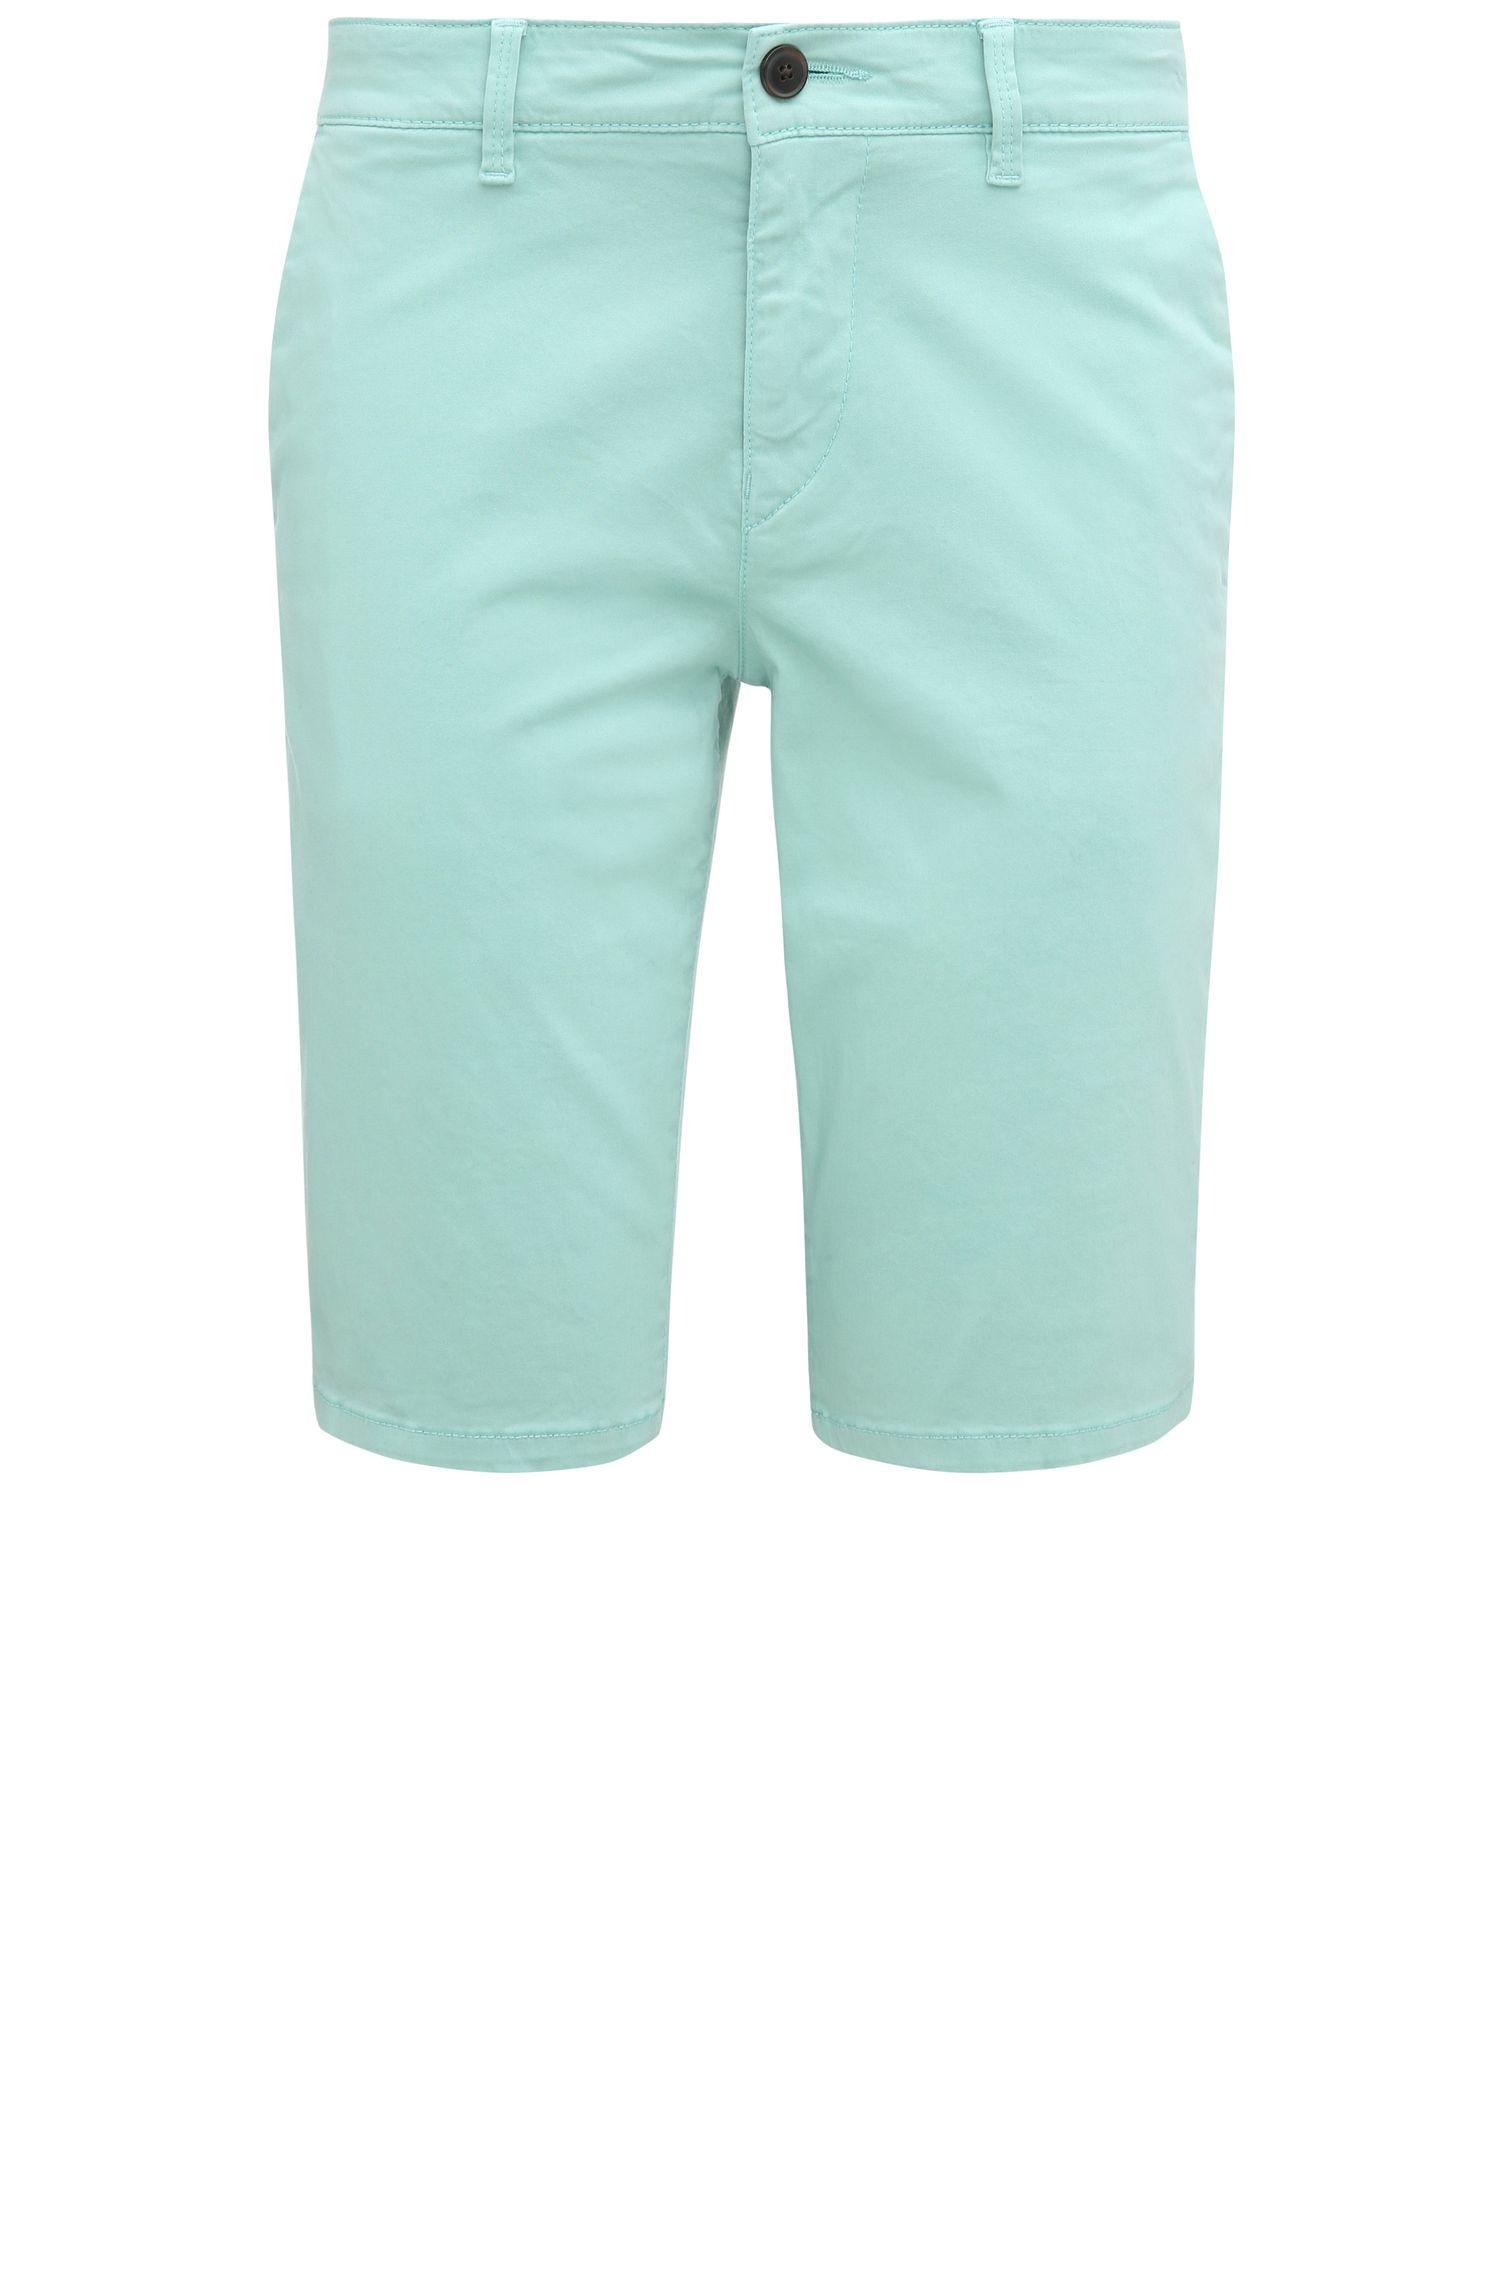 'Schino Slim Shorts D' | Slim Fit, Stretch Cotton Shorts